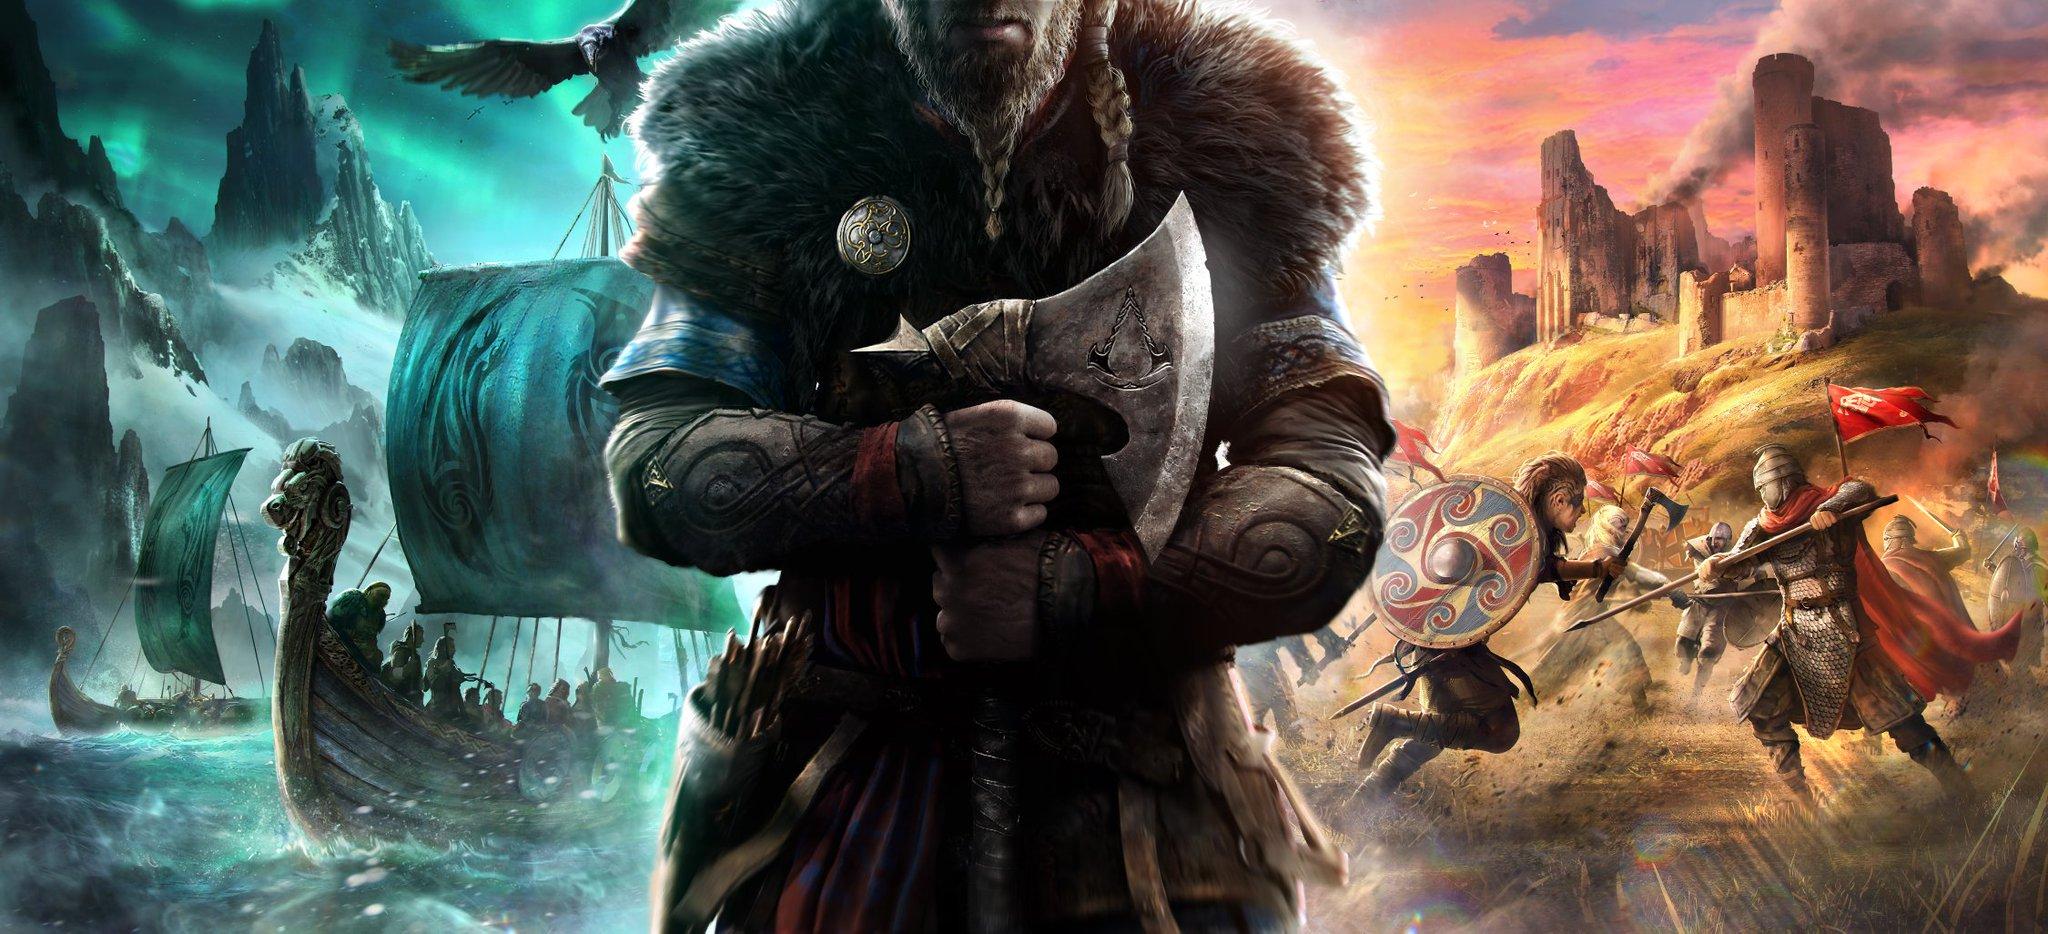 Как в интернете отреагировали на анонс Assassin's Creed Valhalla?